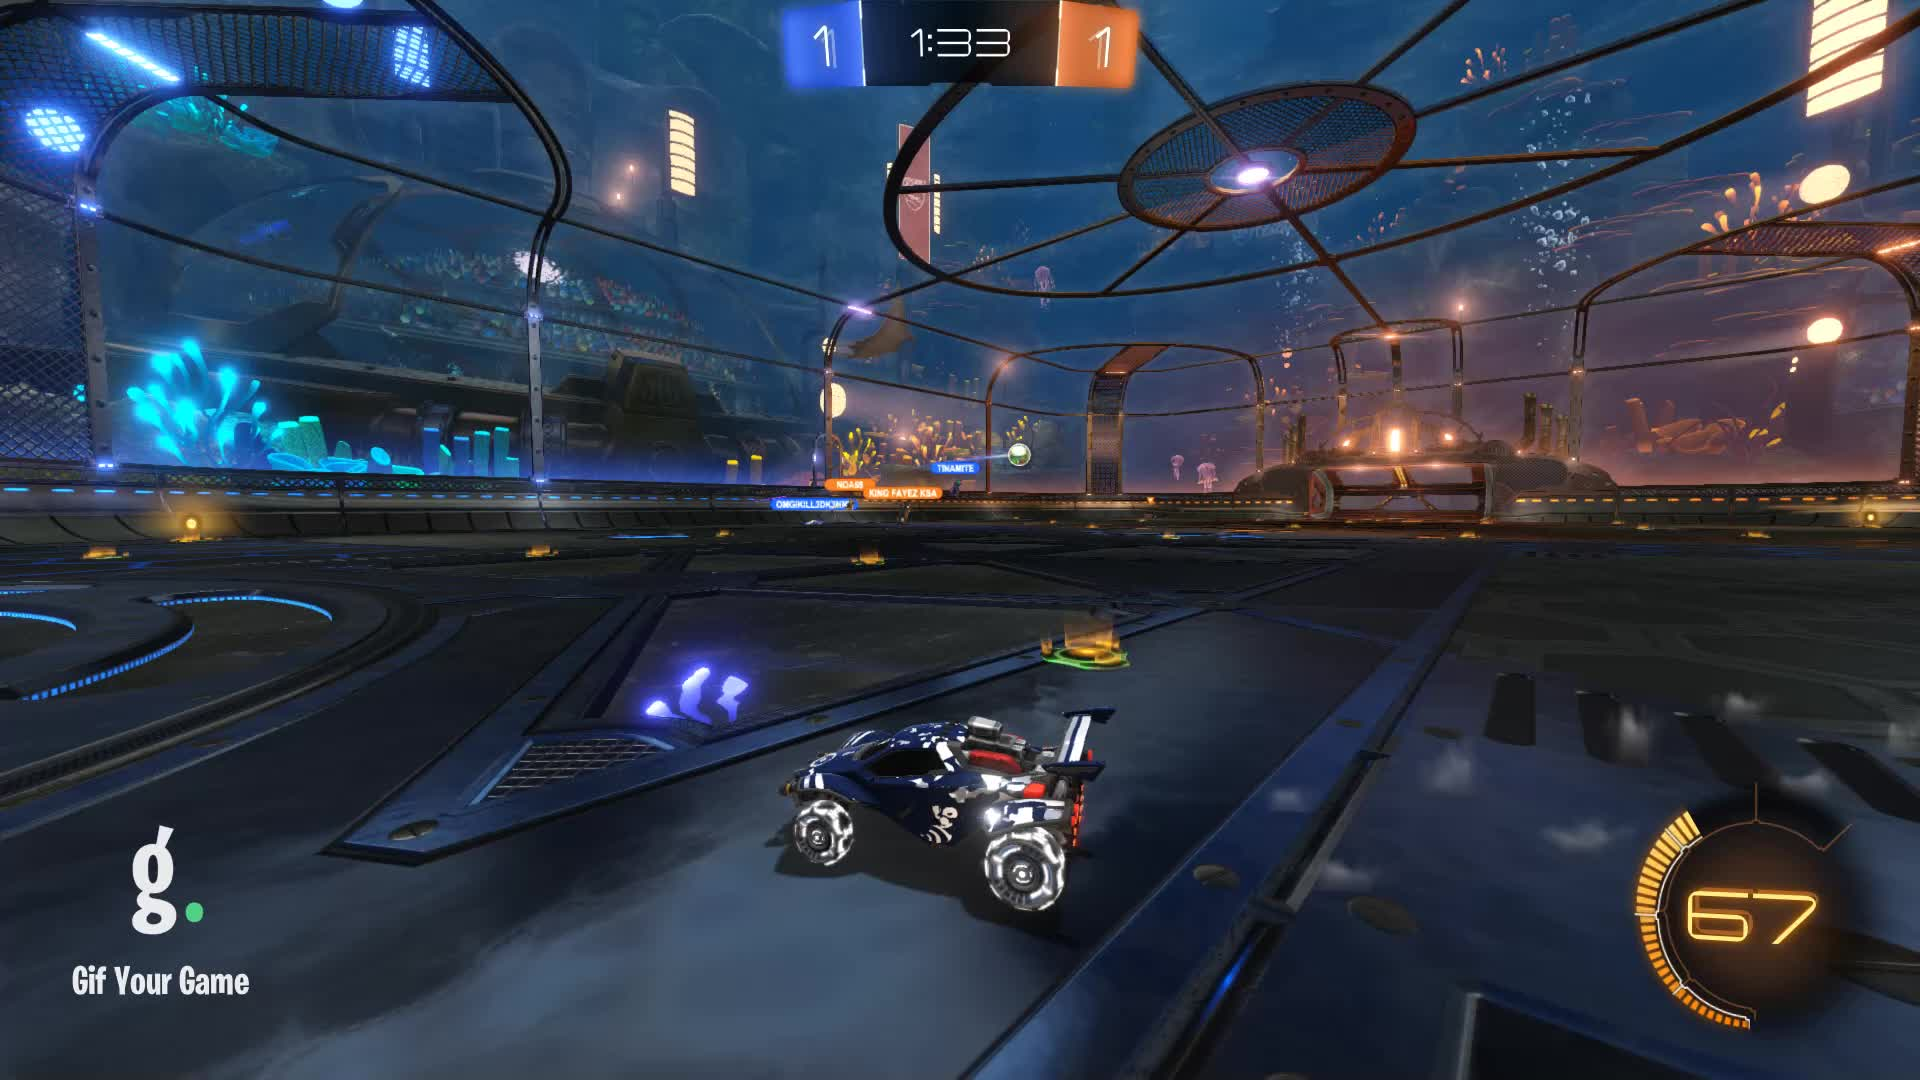 Gif Your Game, GifYourGame, Goal, Goldfish, Rocket League, RocketLeague, Goal 3: Goldfish GIFs